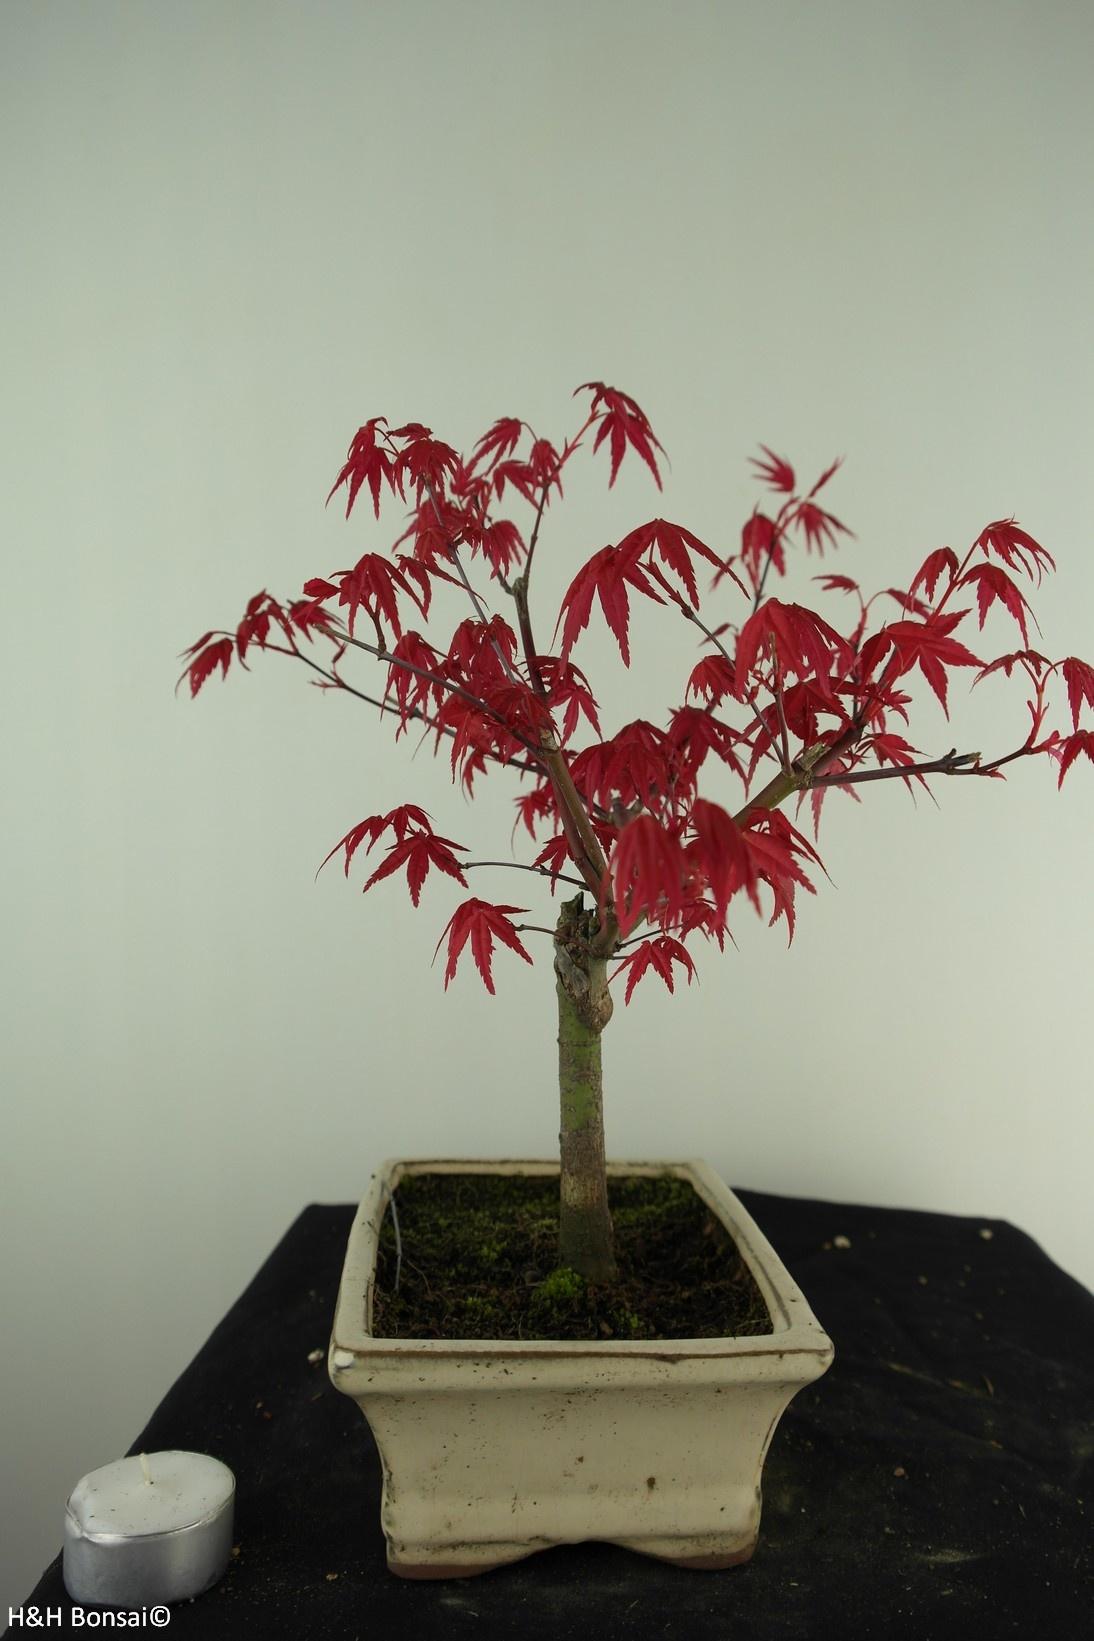 Bonsai Japanese Red Maple, Acer palmatum deshojo, no. 7465